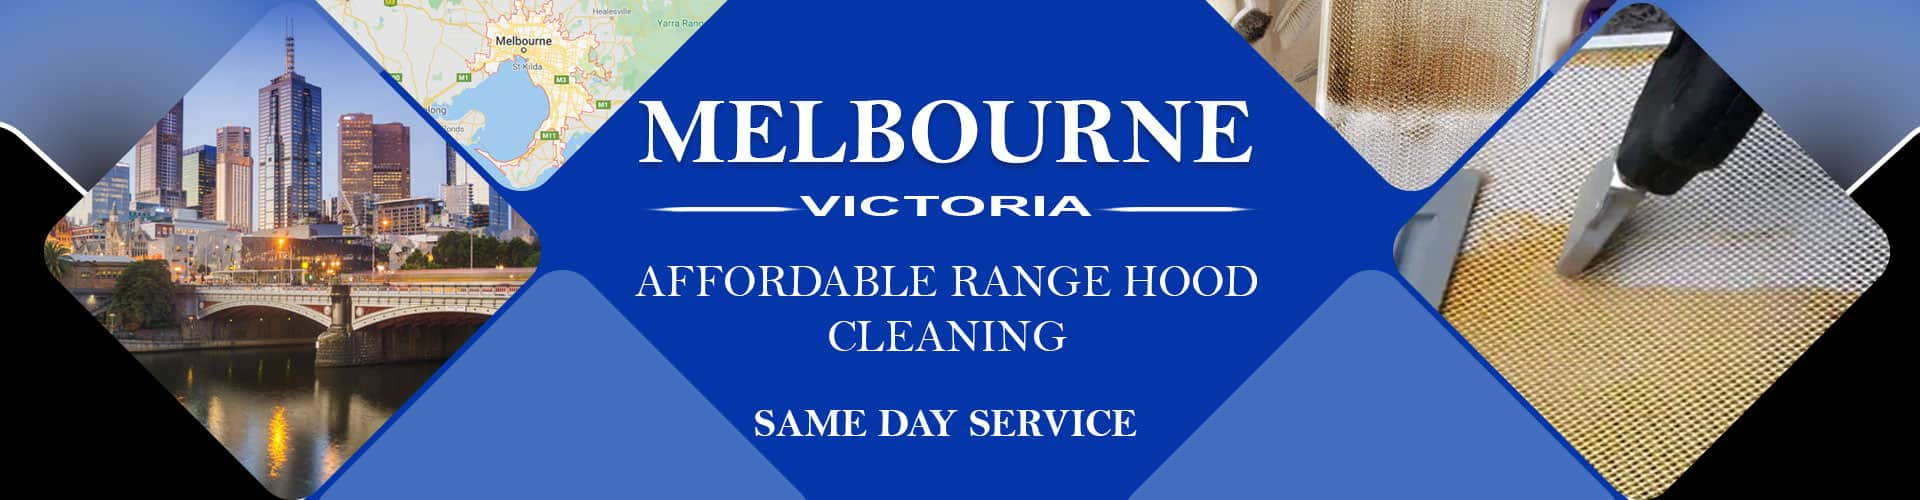 Affordable Range Hood Cleaning in Melbourne